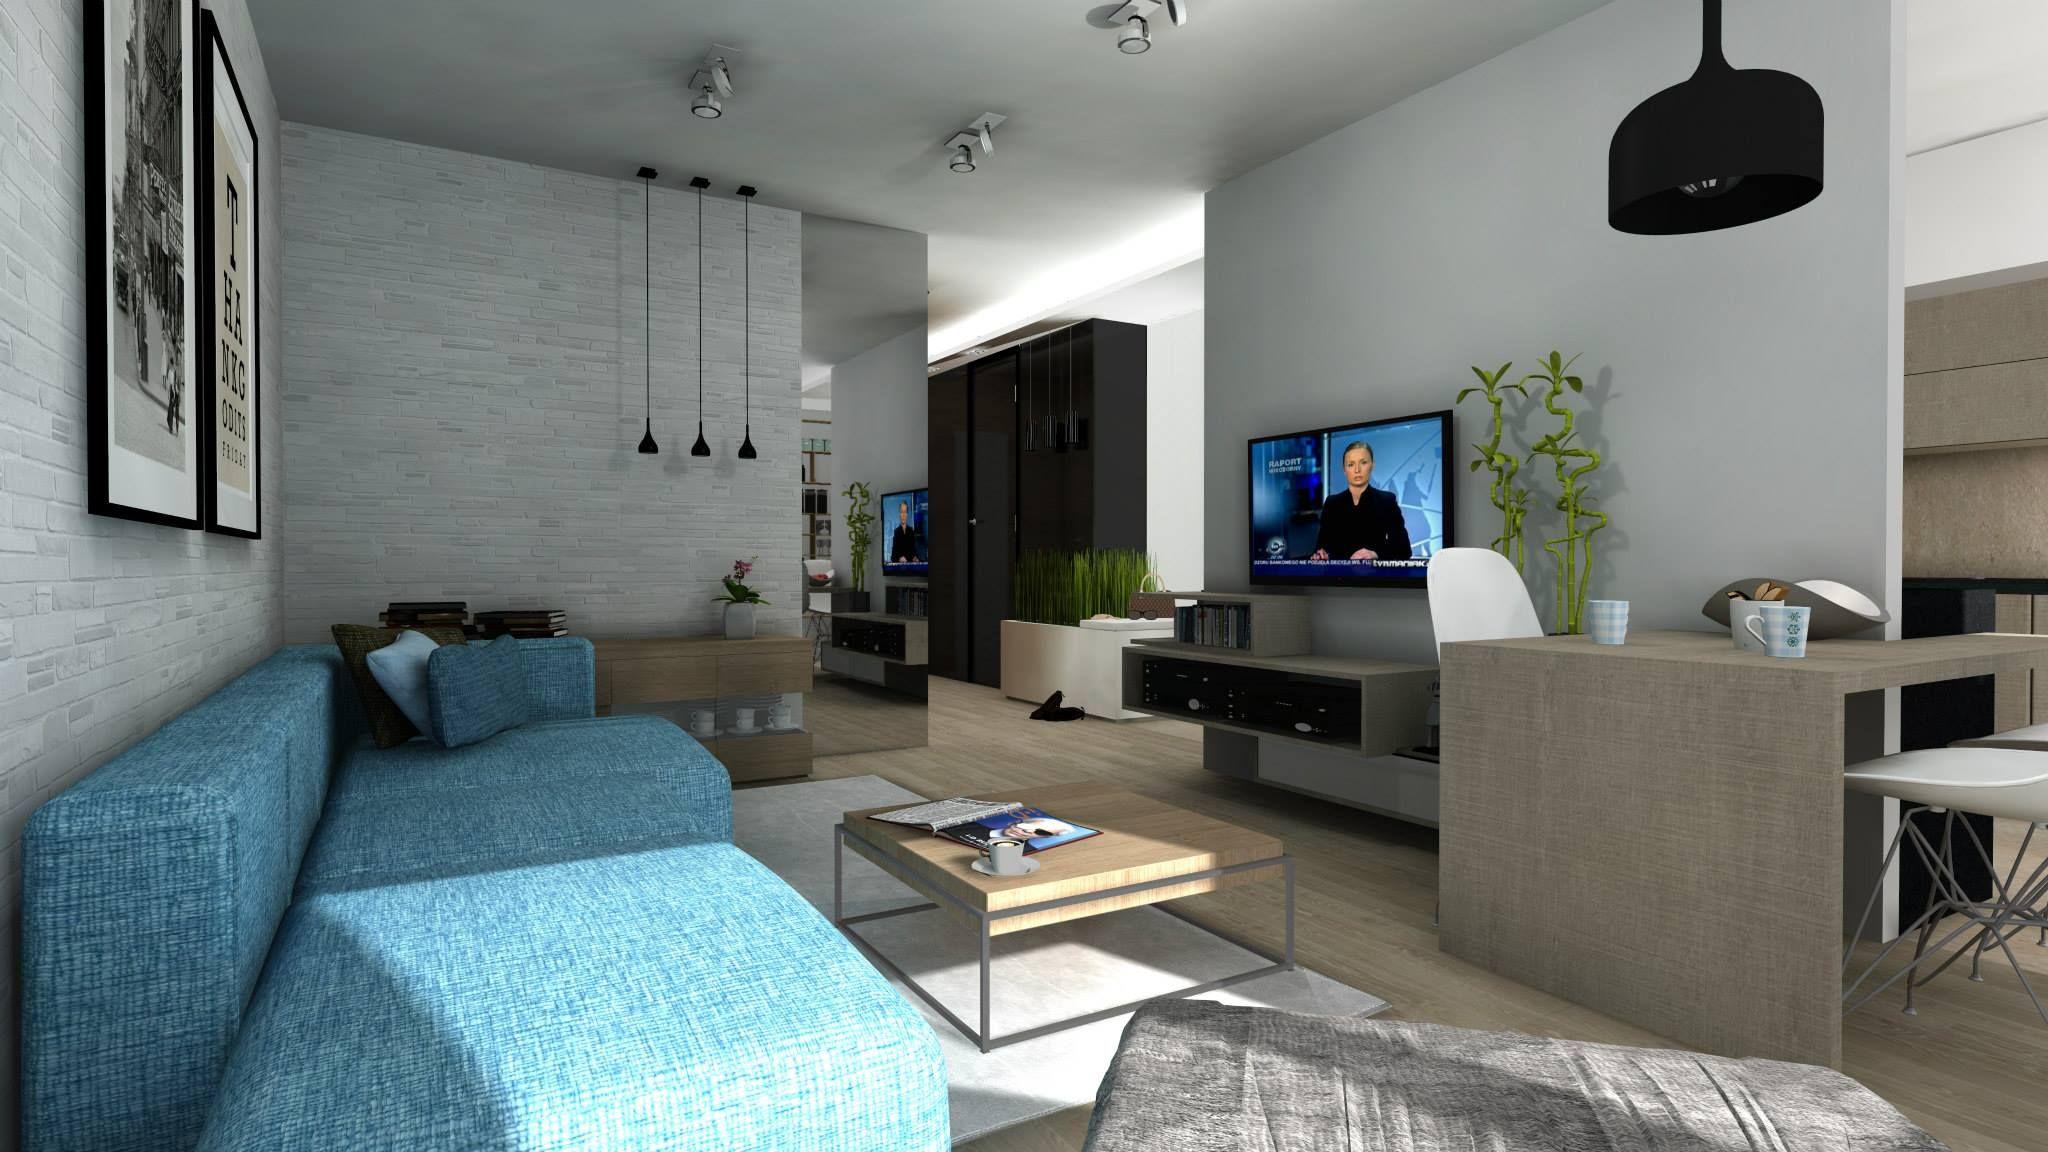 Odswiezony Projekt Naszego Salonu Coffe Table Living Room Room